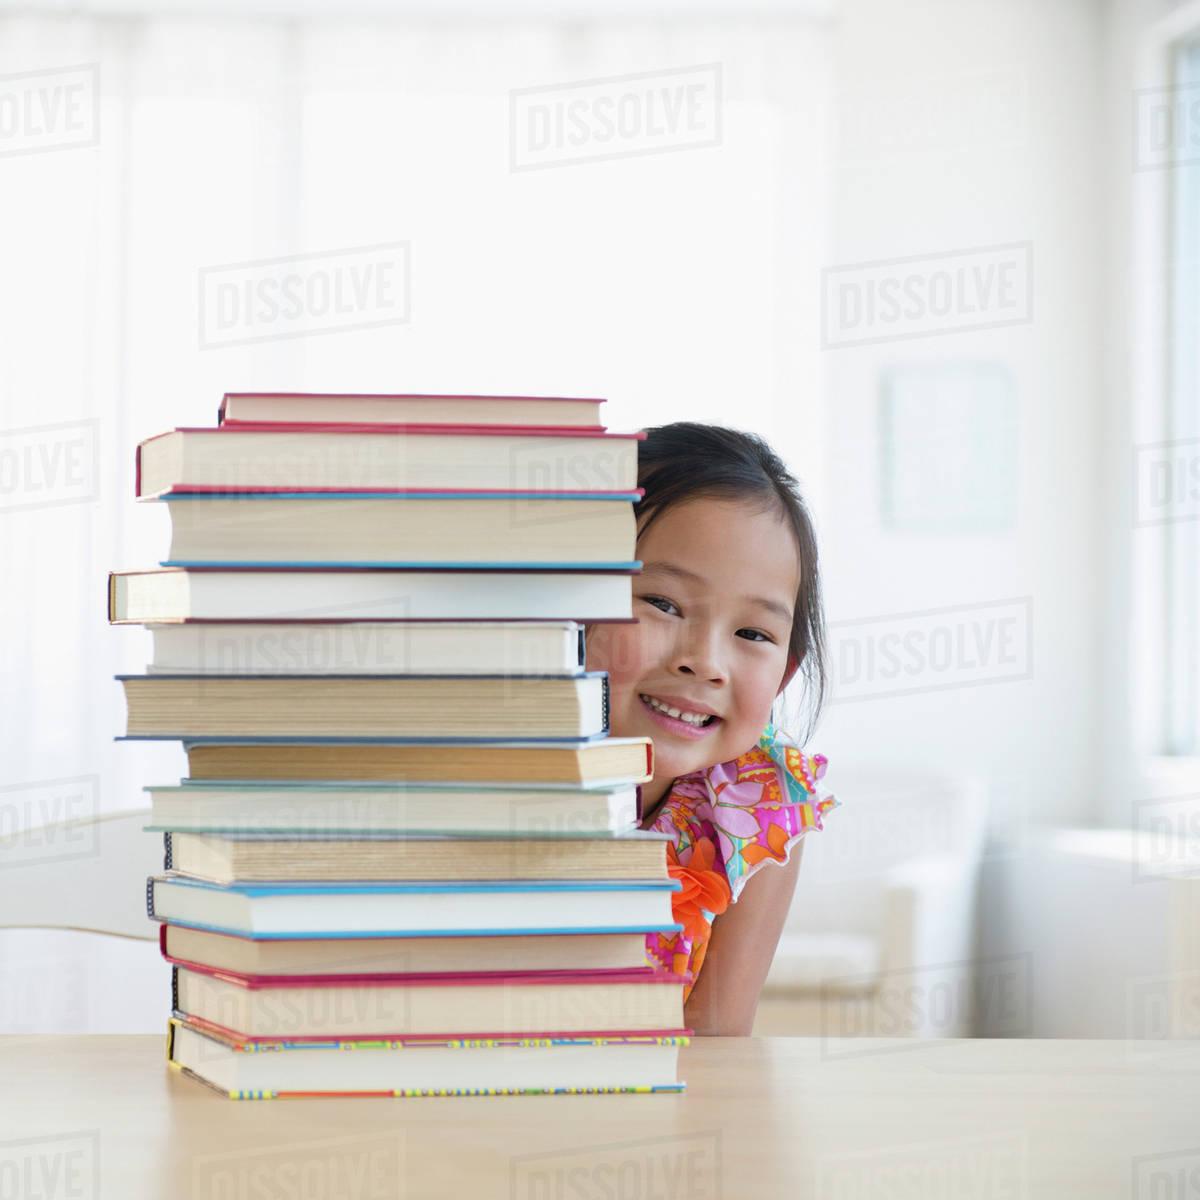 Korean girl peeking from behind stack of books stock photo